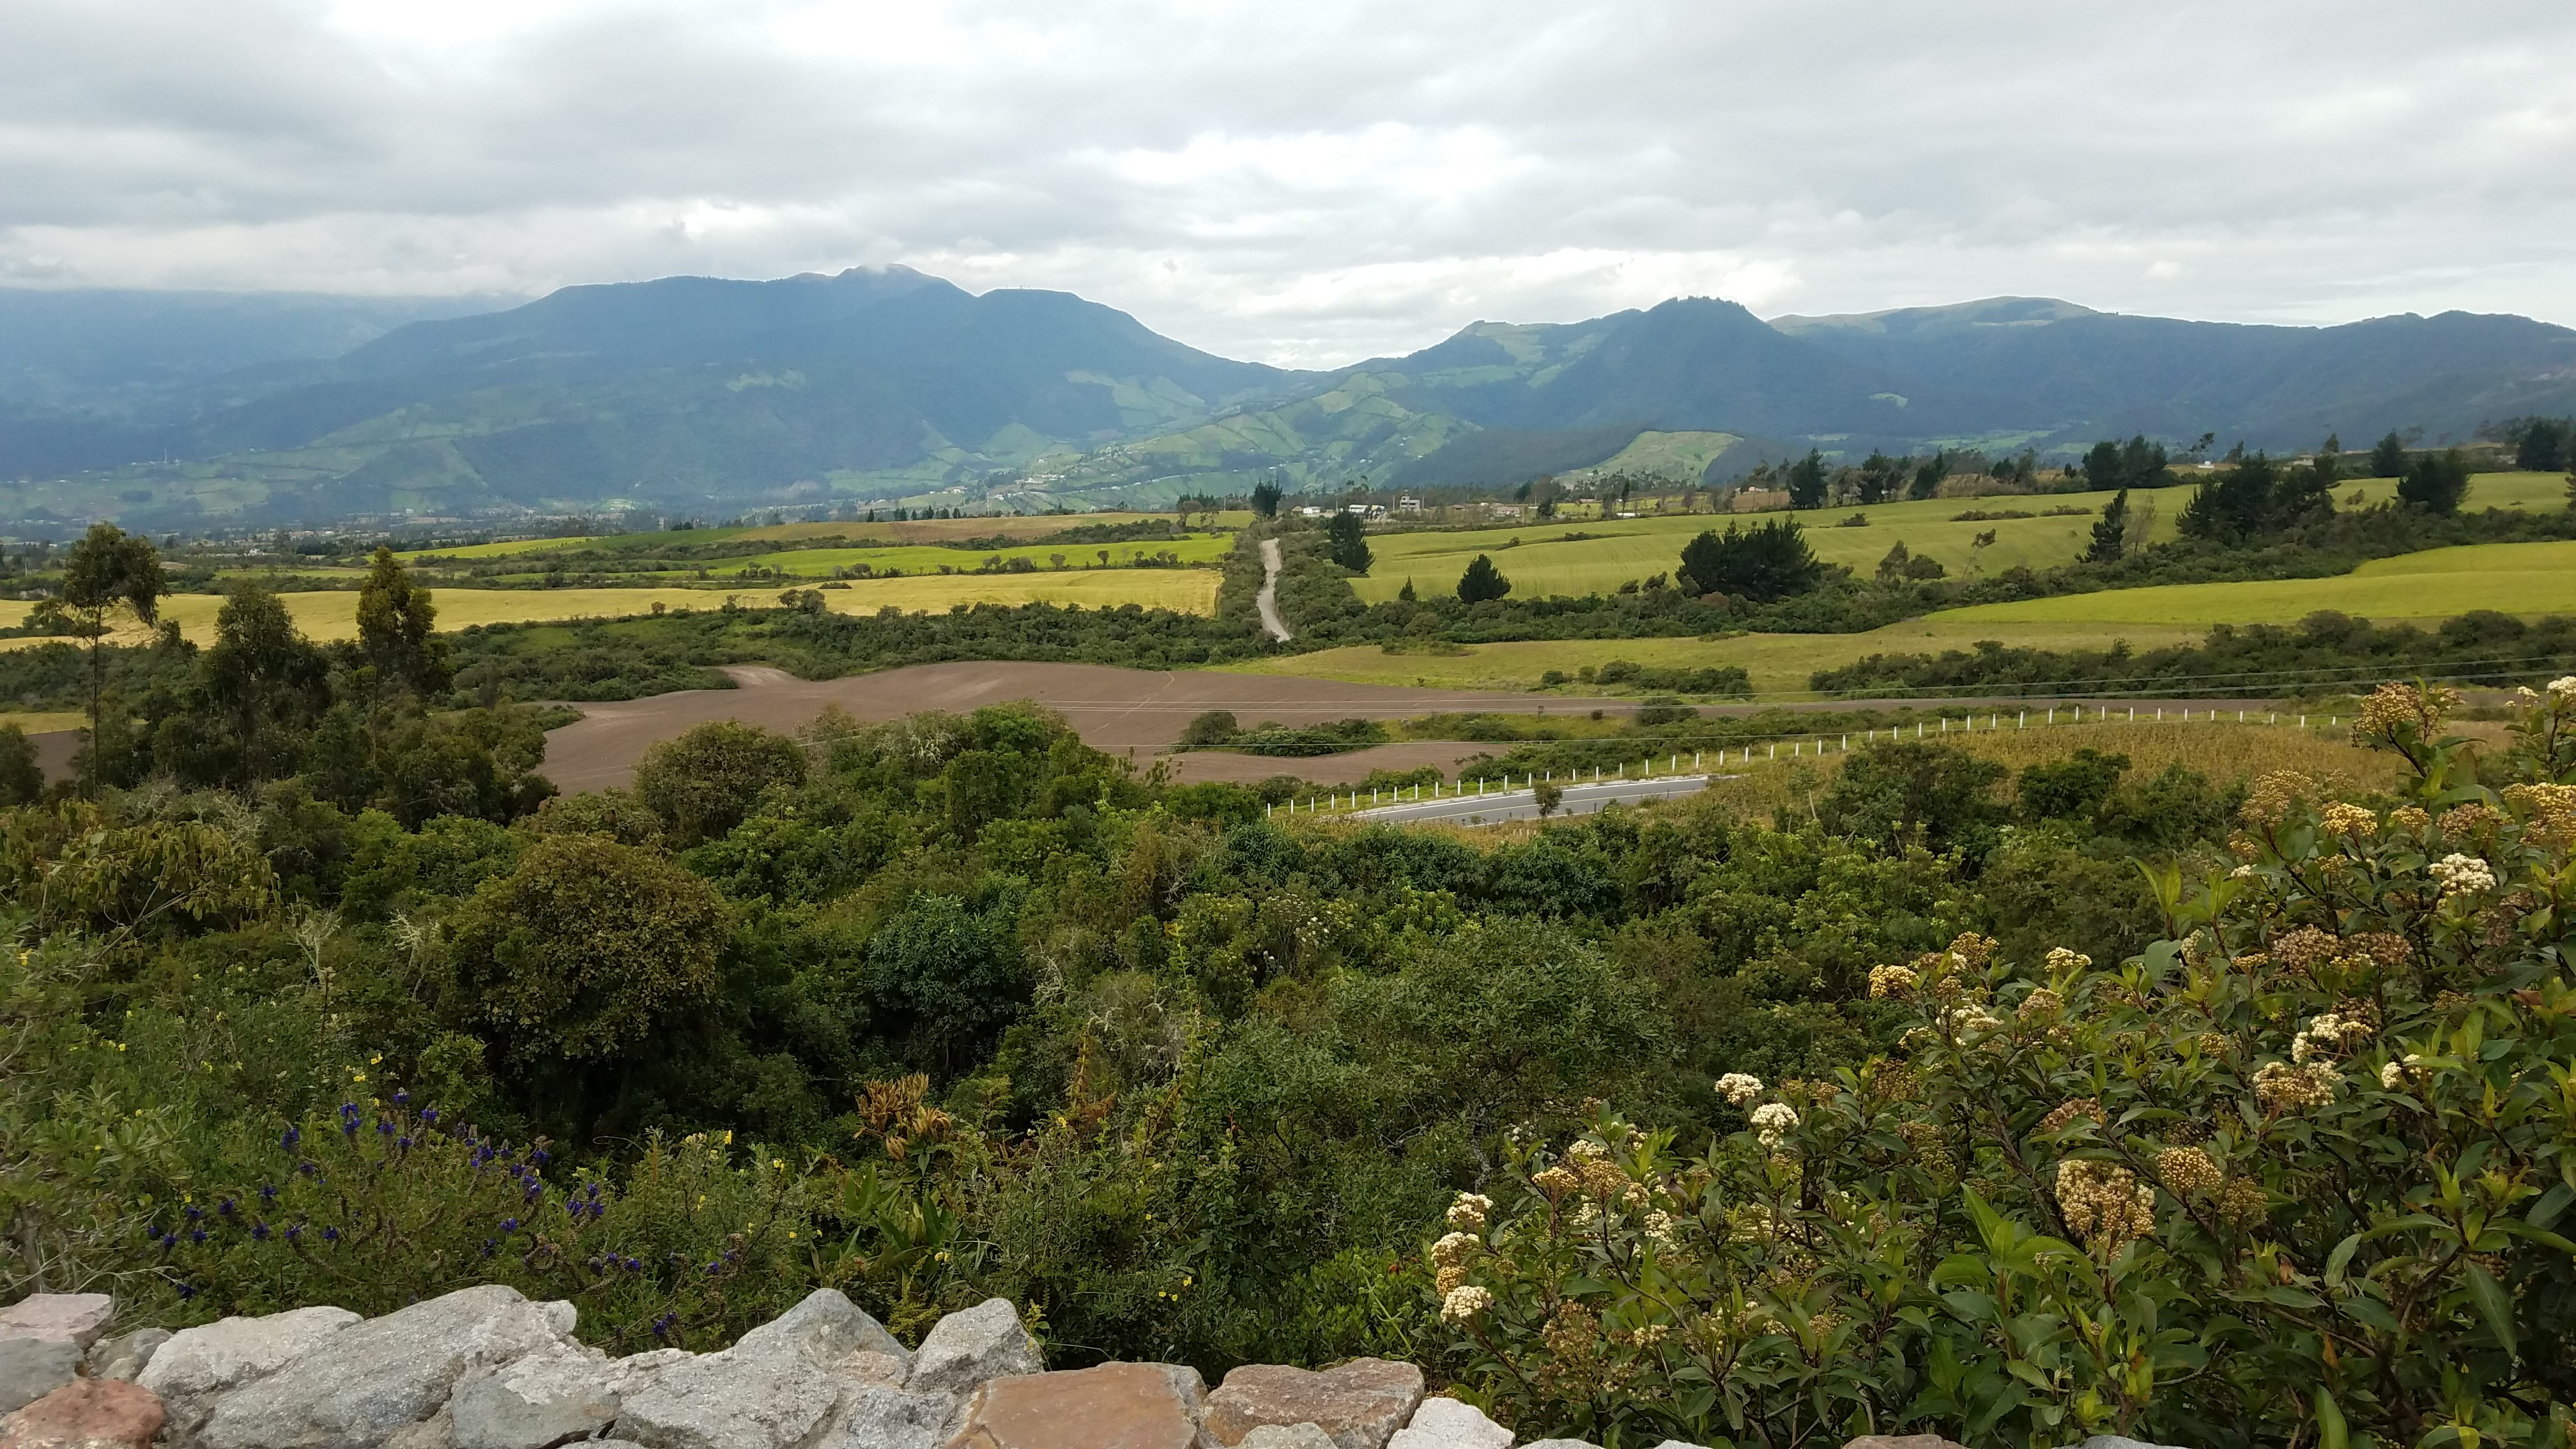 Ecuador: Day 4 – Otavalo to Quito